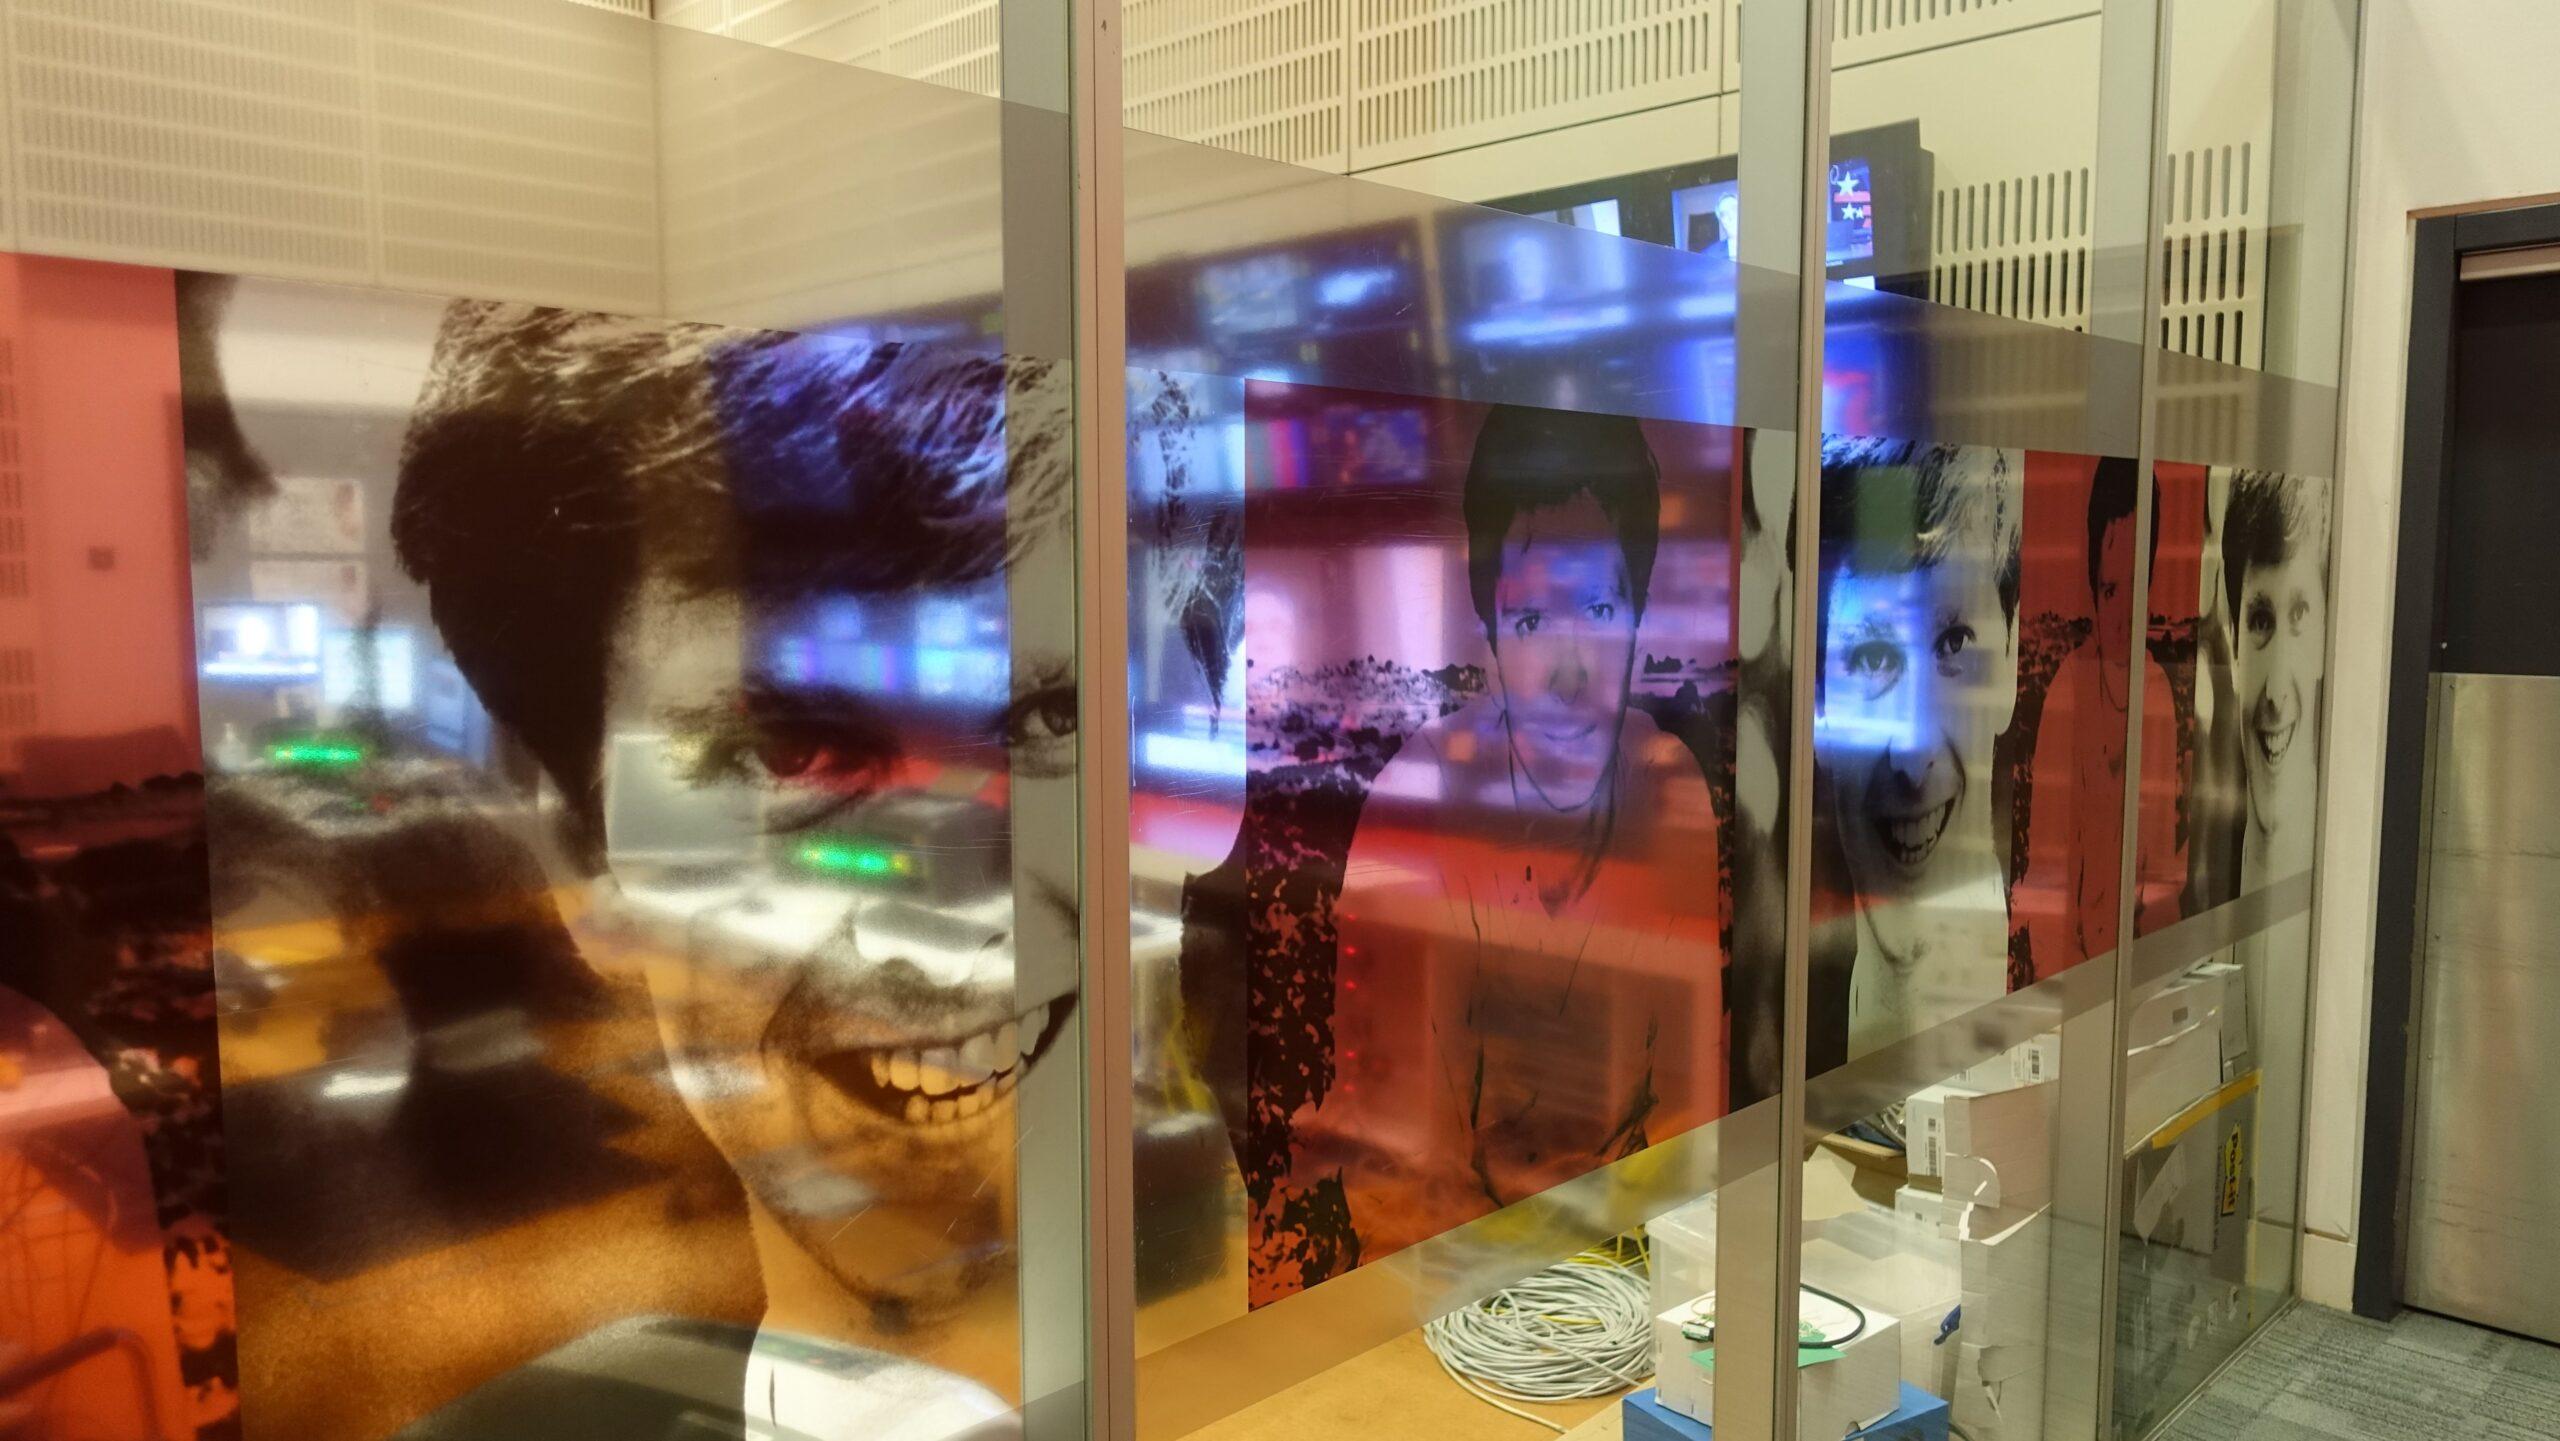 BBC's John Schofield Room